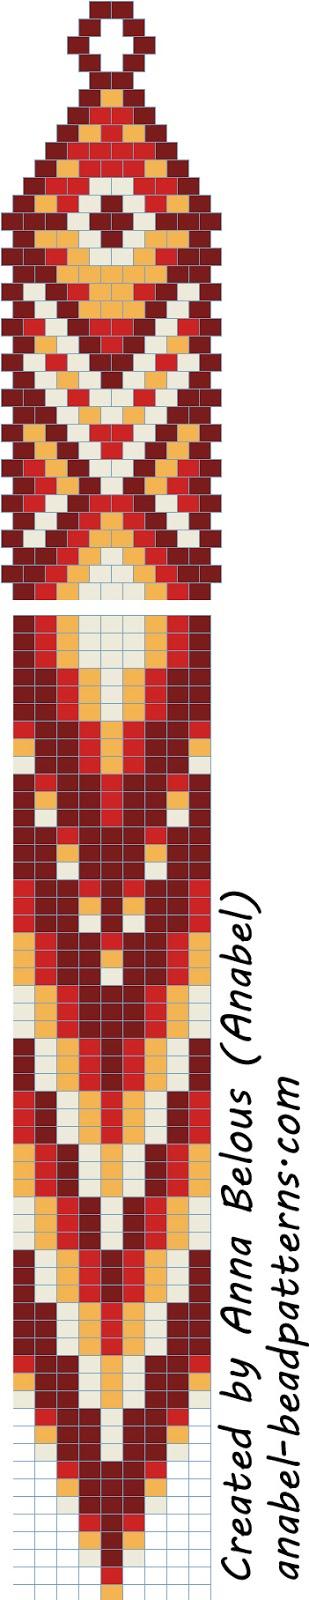 Схема длинных серег с бахромой